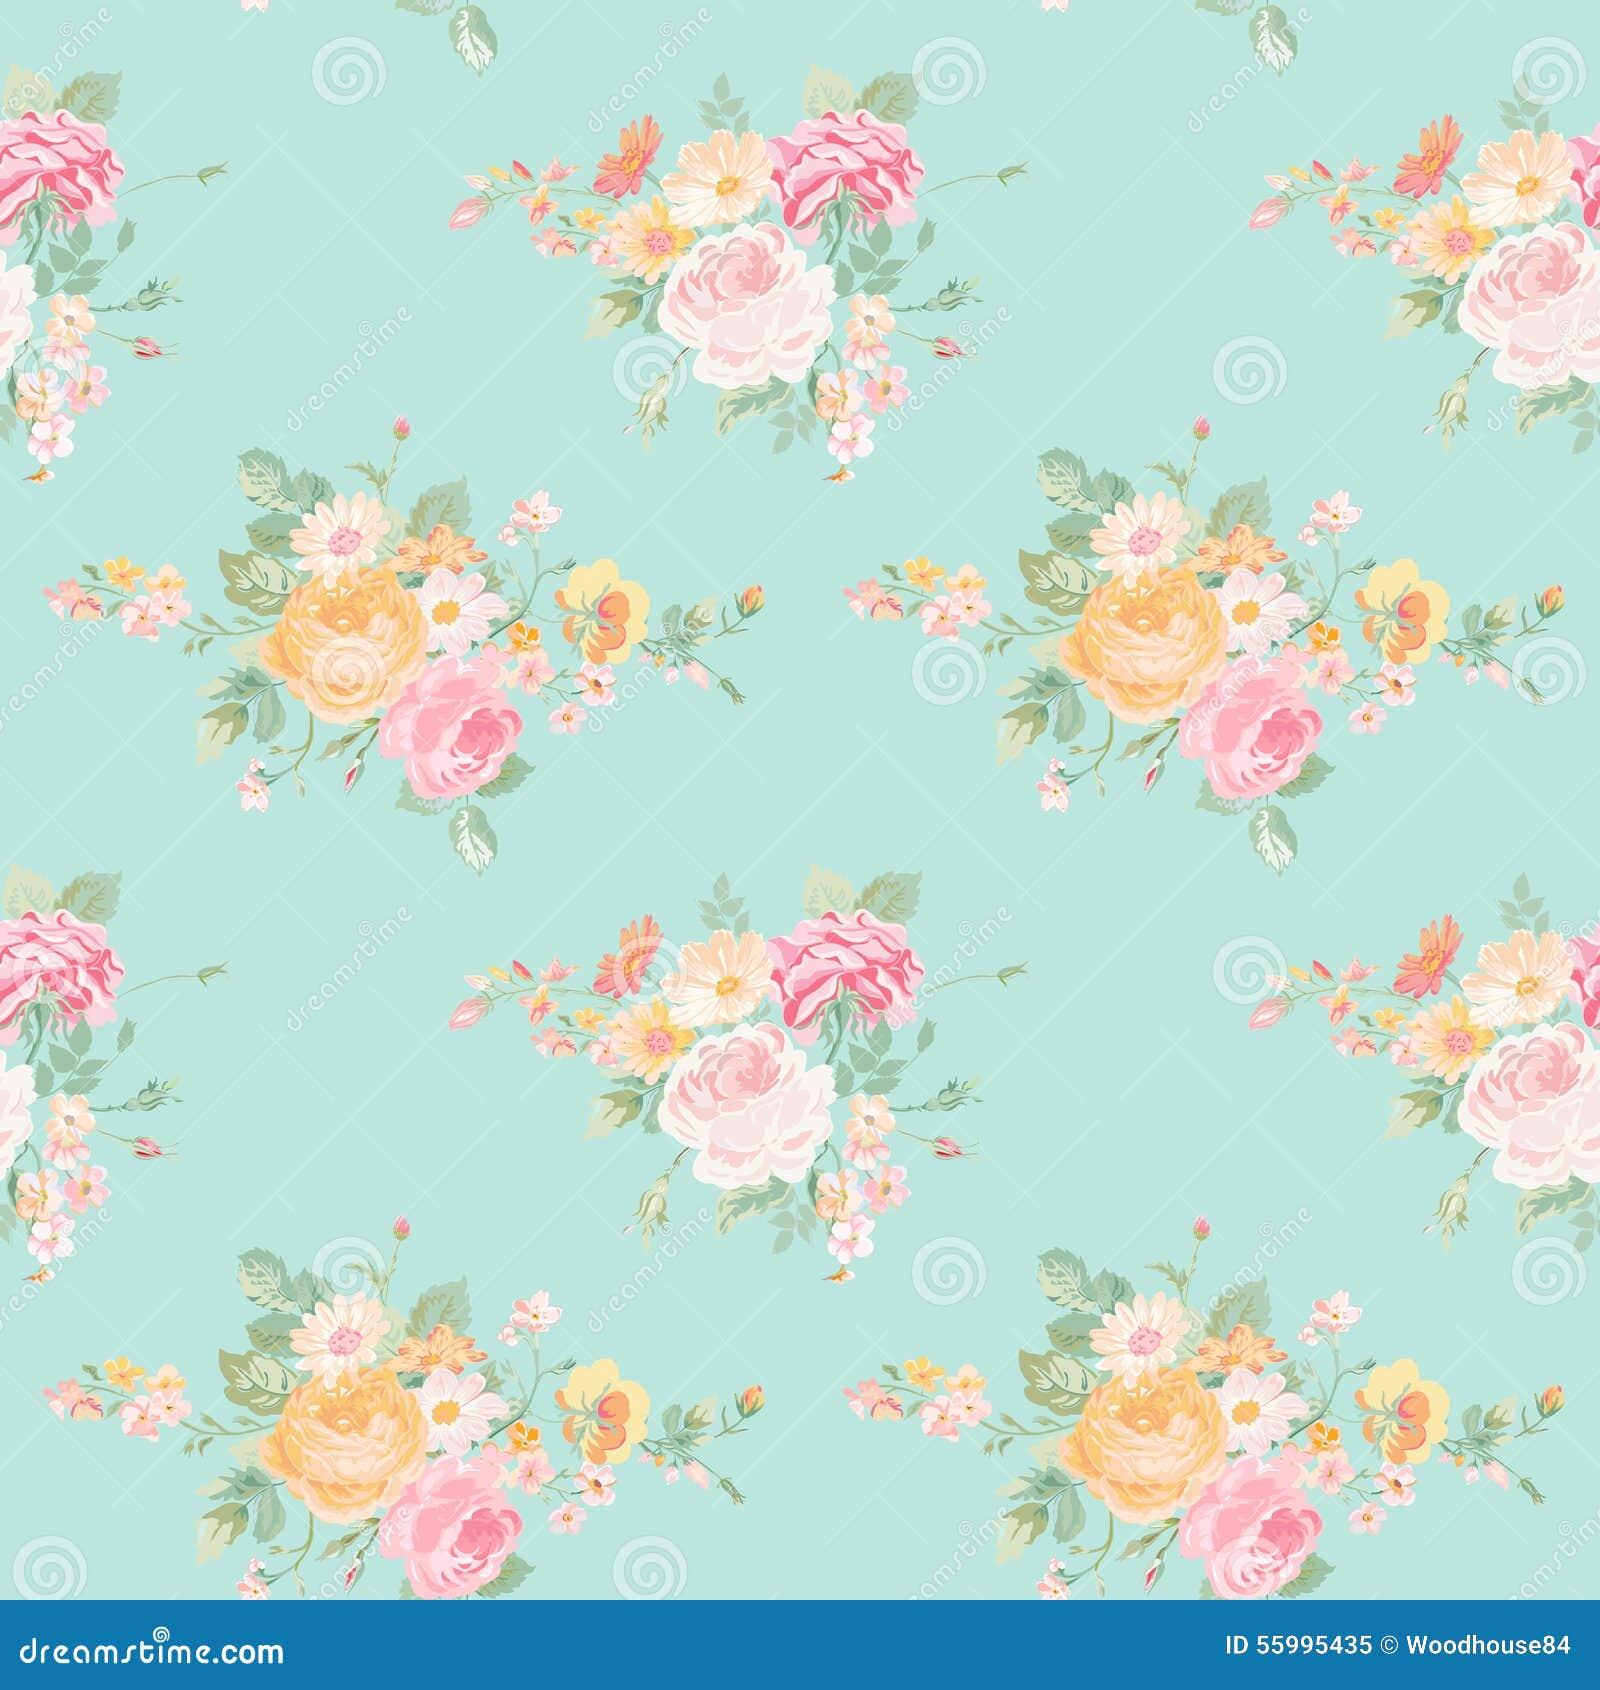 Vintage Flowers Background Stock Vector